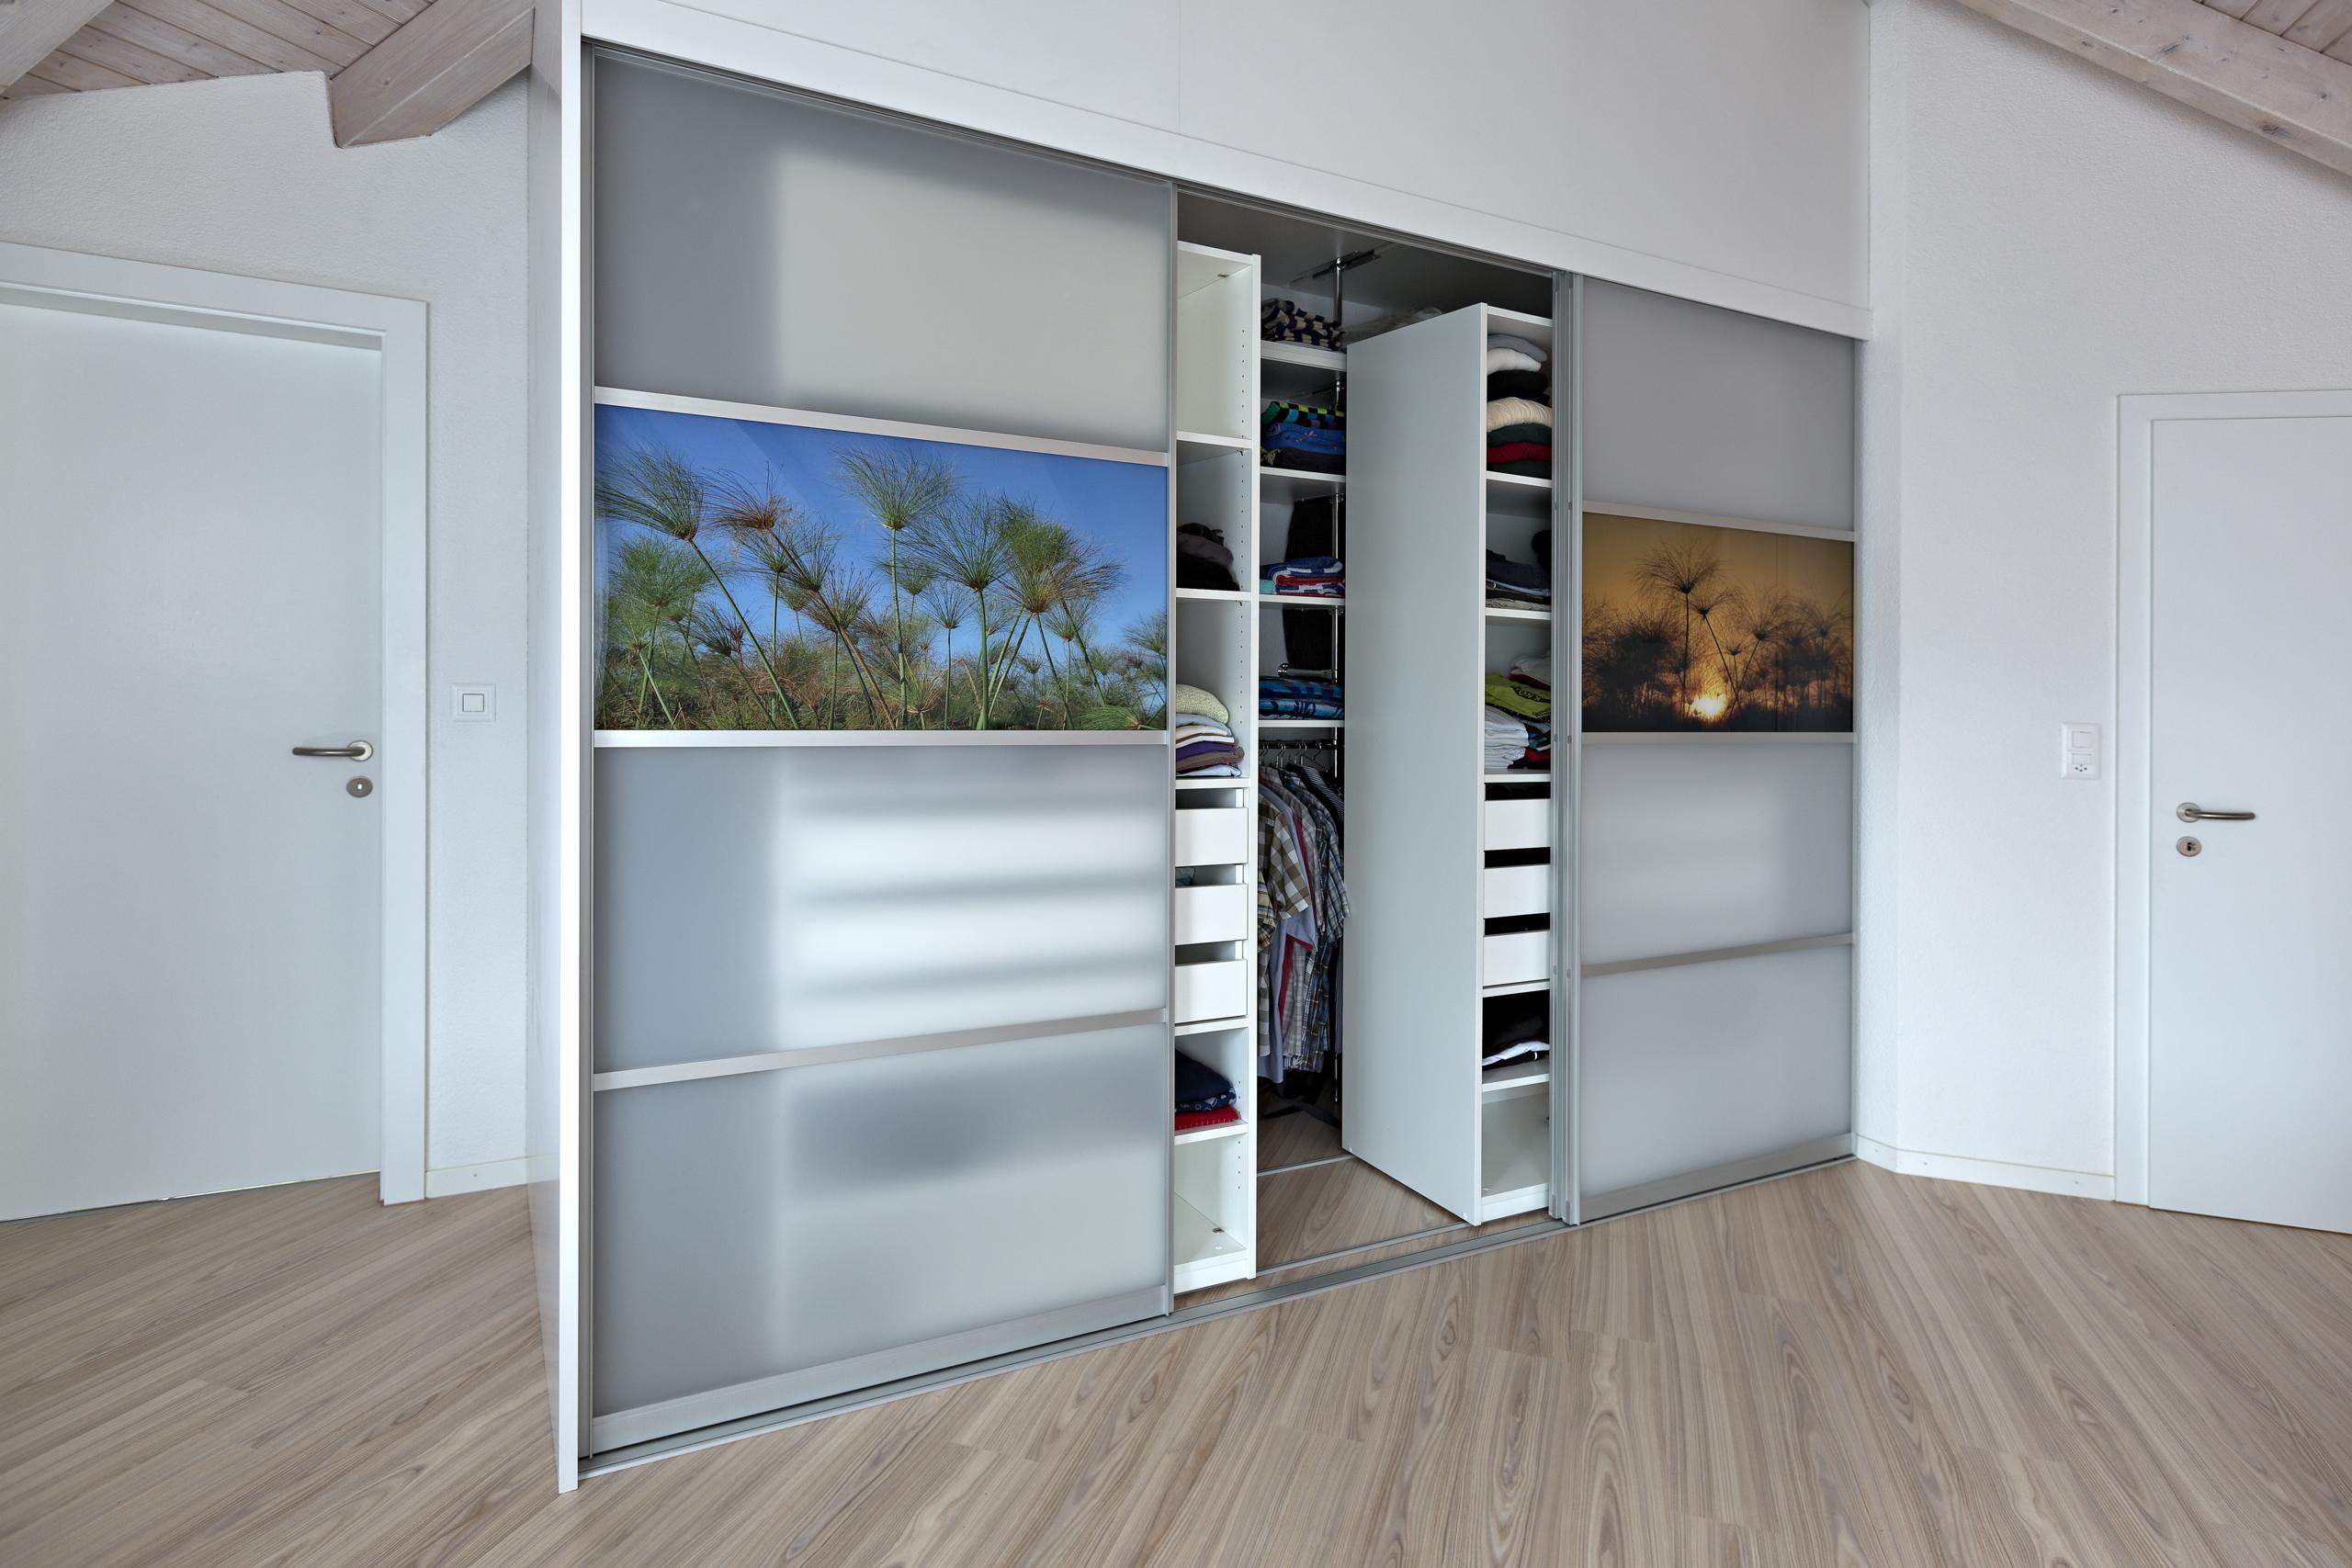 doppeltr innen cool die besten doppelt verglaste ideen auf schn doppelt verglaste fenster with. Black Bedroom Furniture Sets. Home Design Ideas